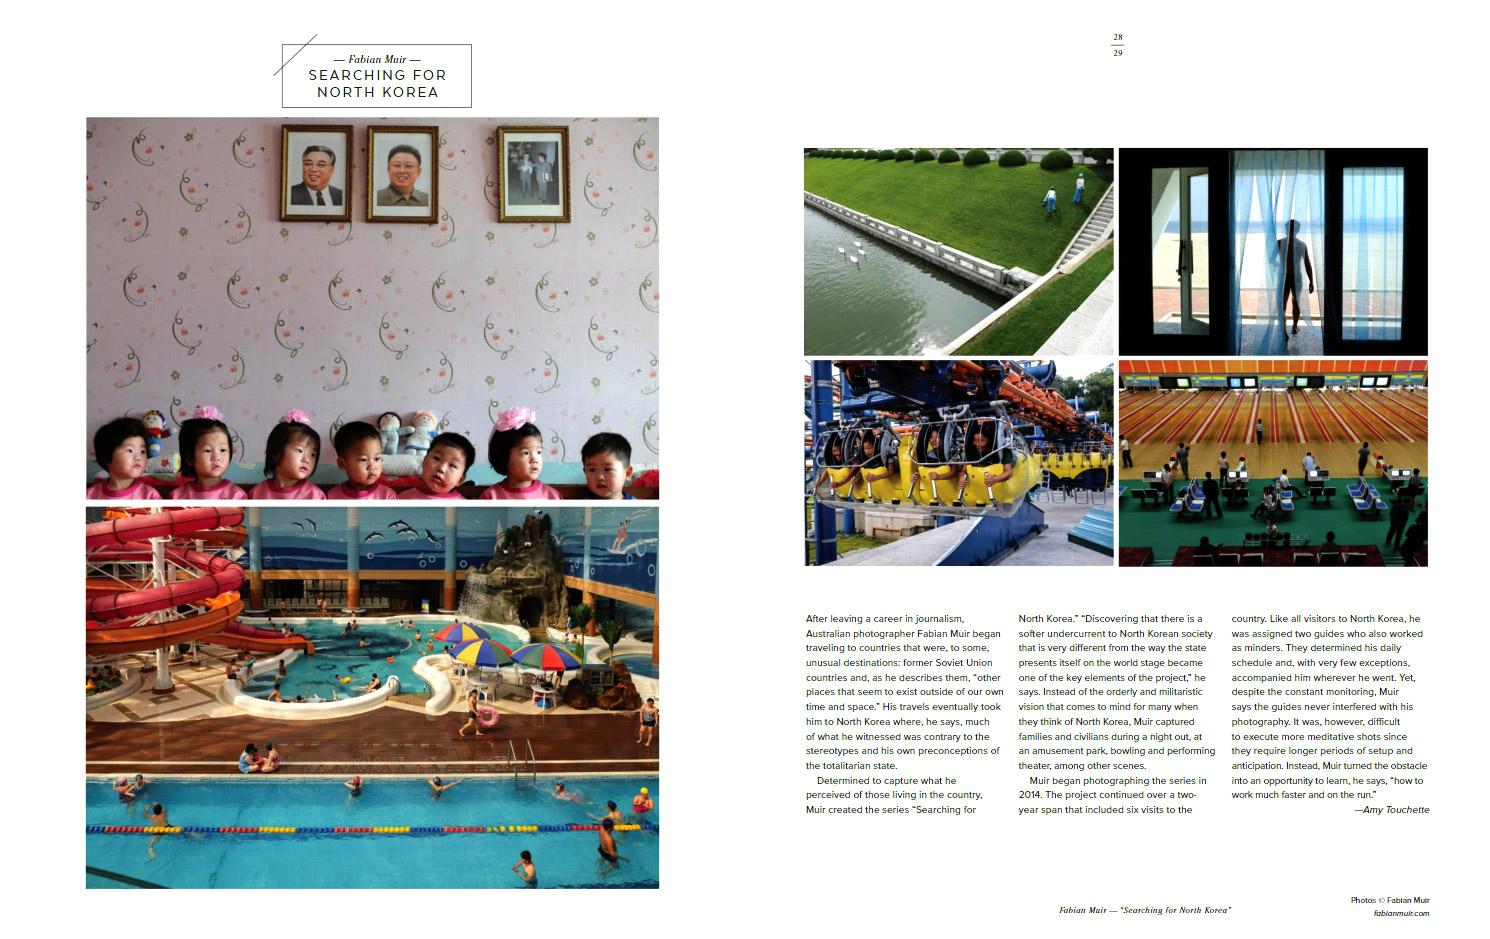 Searching For North Korea, © Fabian Muir, Emerging Photographer